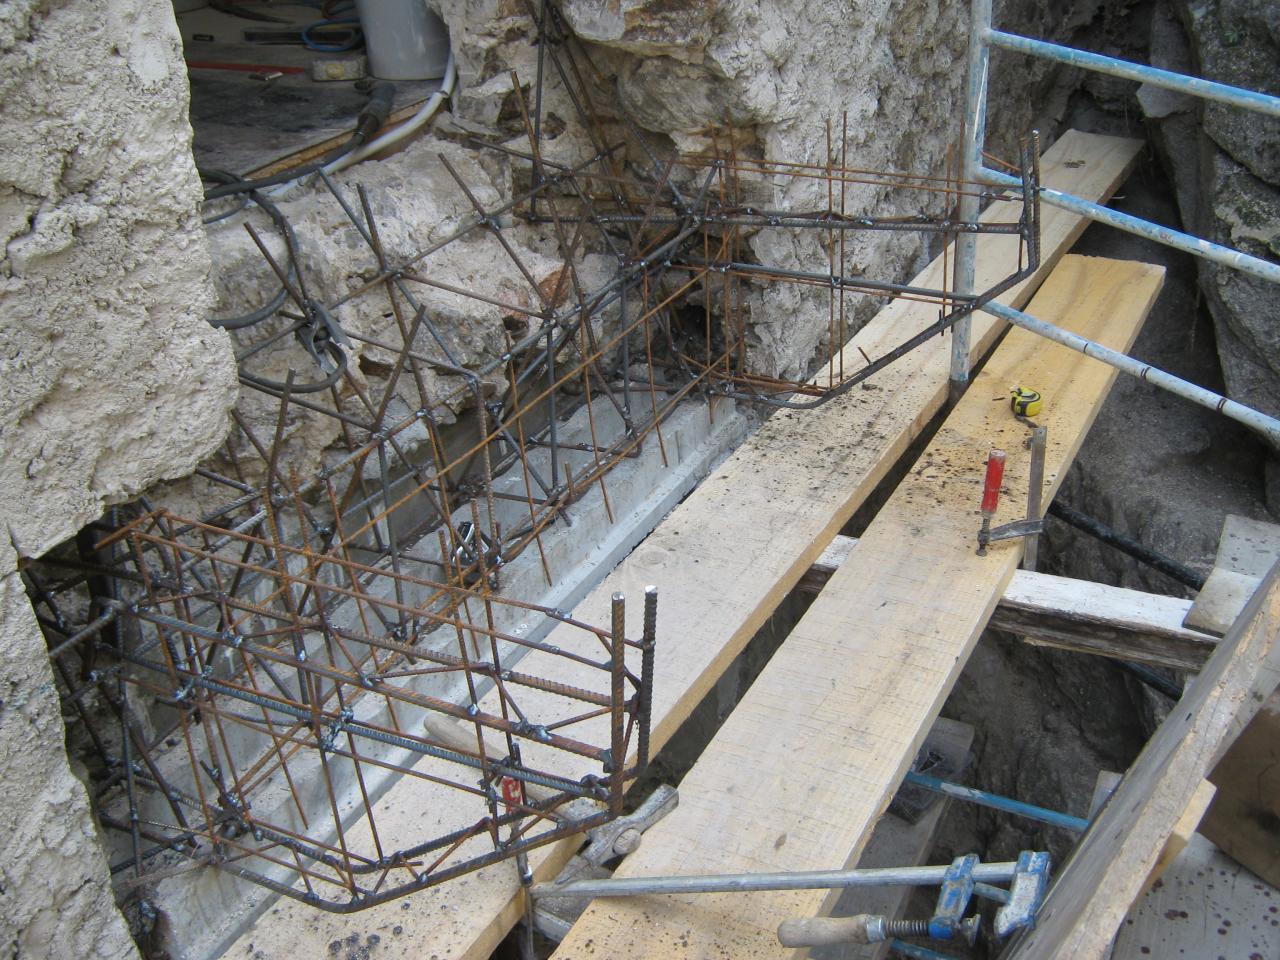 X13422 Ferrailage balcon